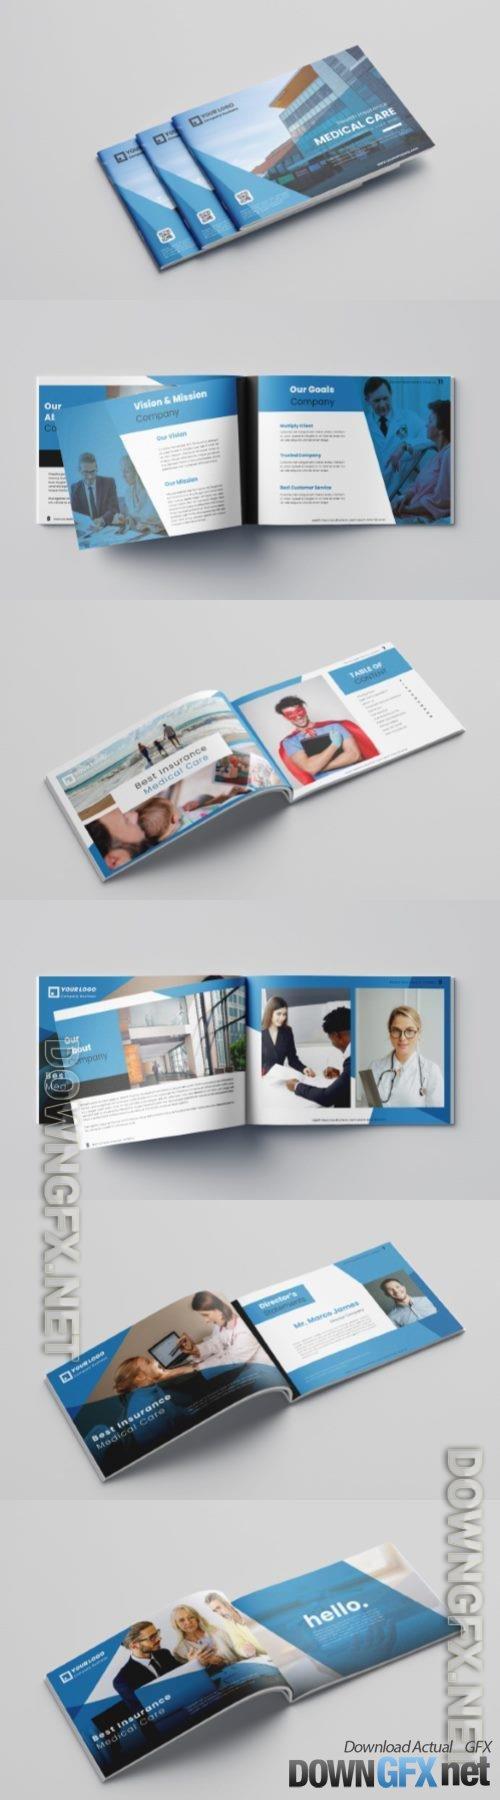 Health Insurance Brochure Vol.2